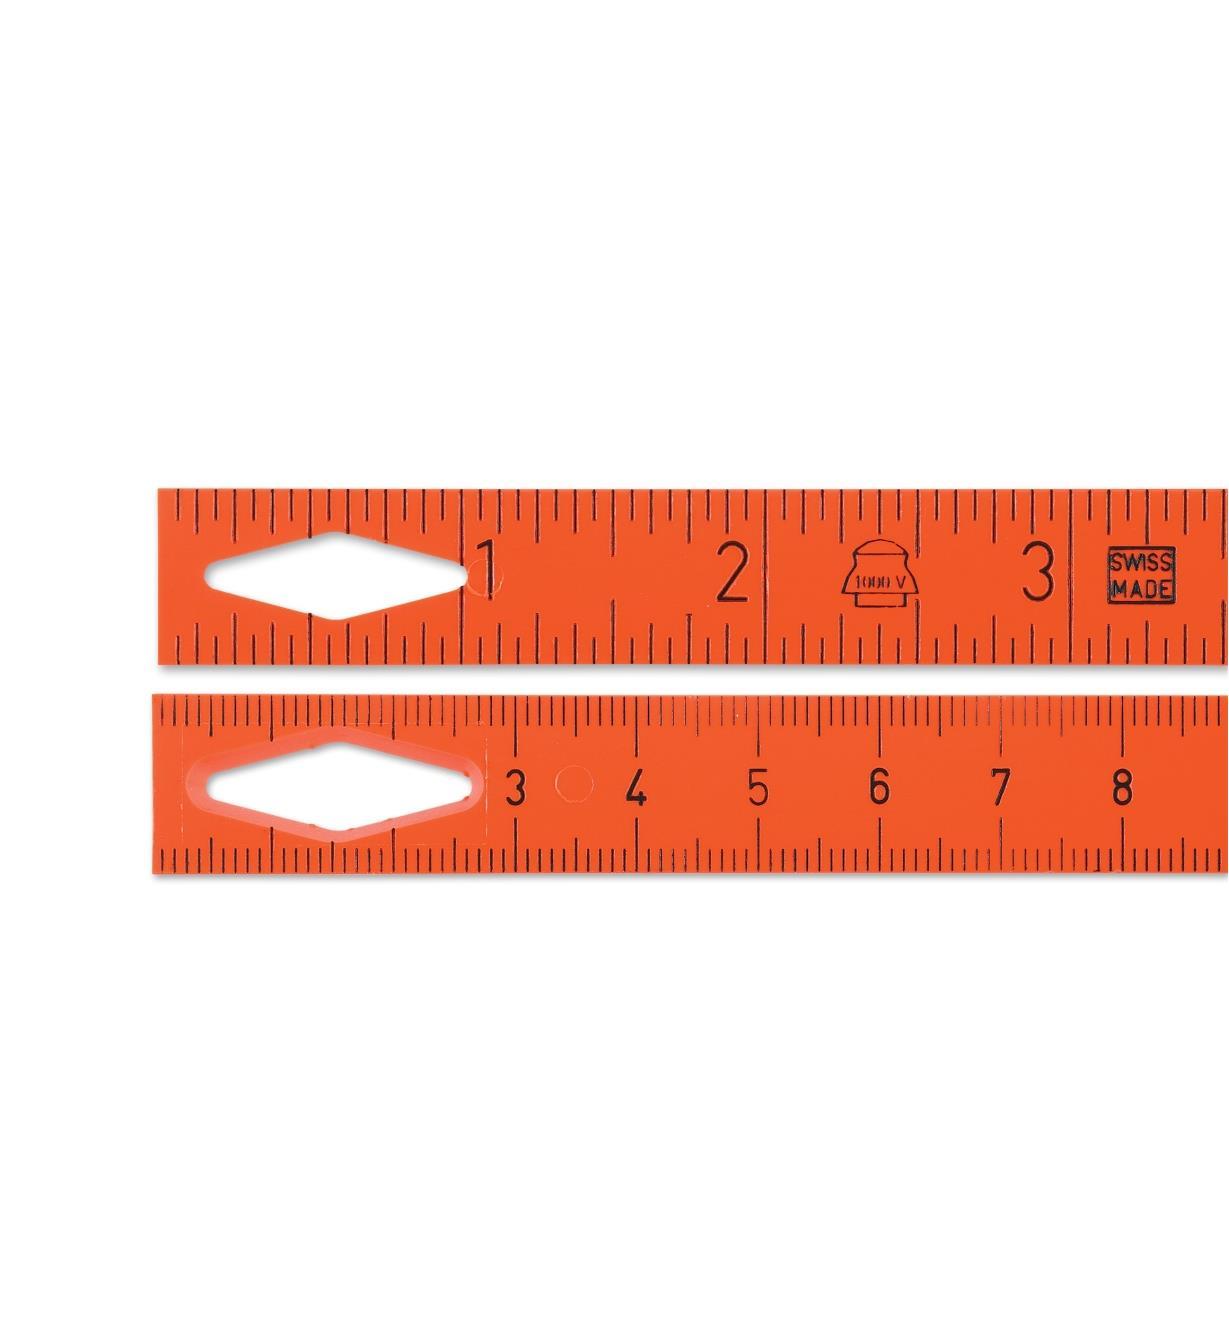 24N0656 - 2m Imp./Metric LongLife 1000V-Insulated Folding Rule